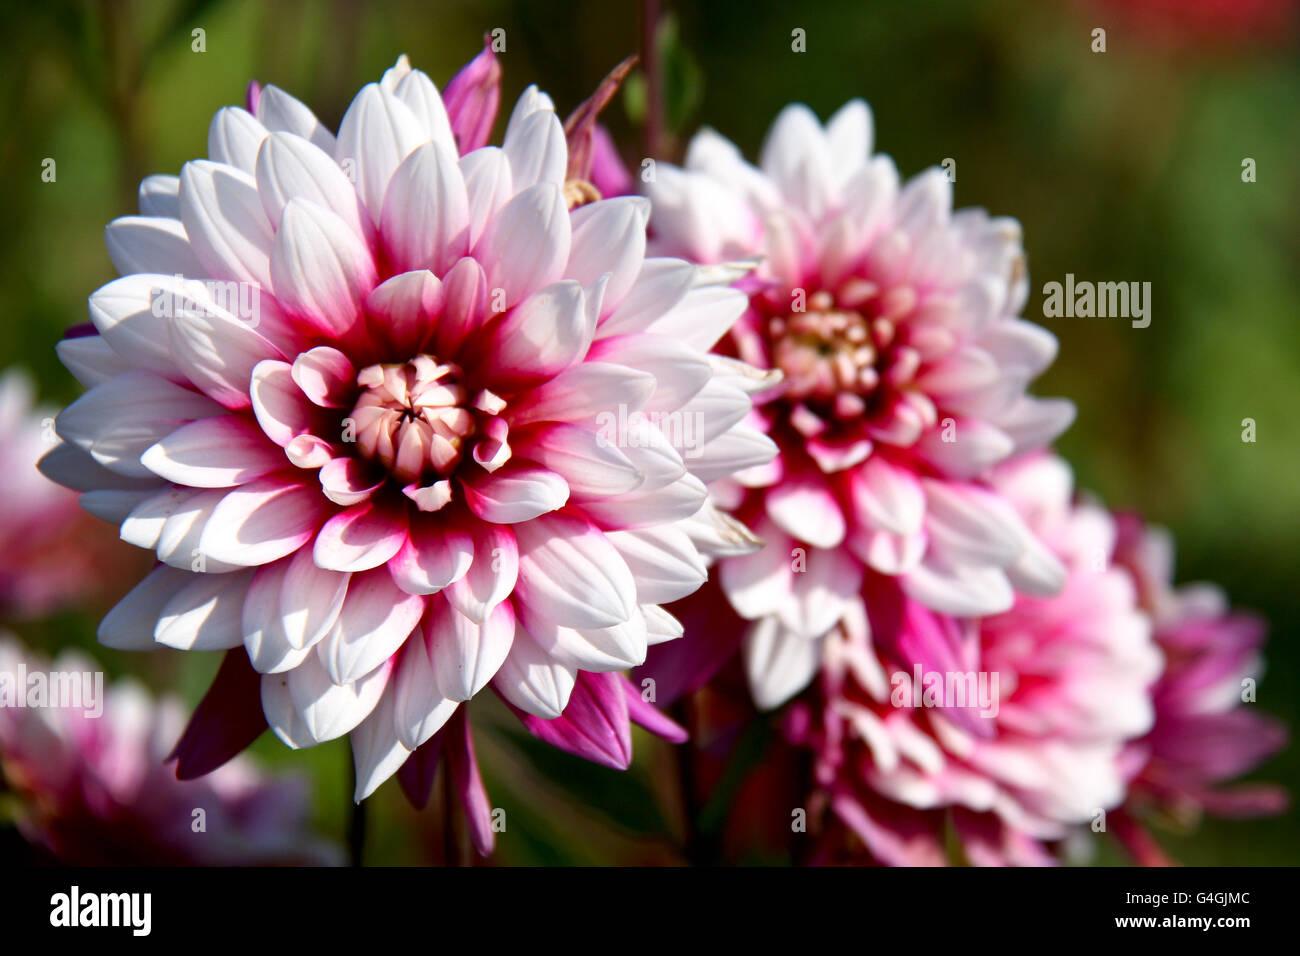 Beautiful autumn flowers - Dahlia aster family. - Stock Image